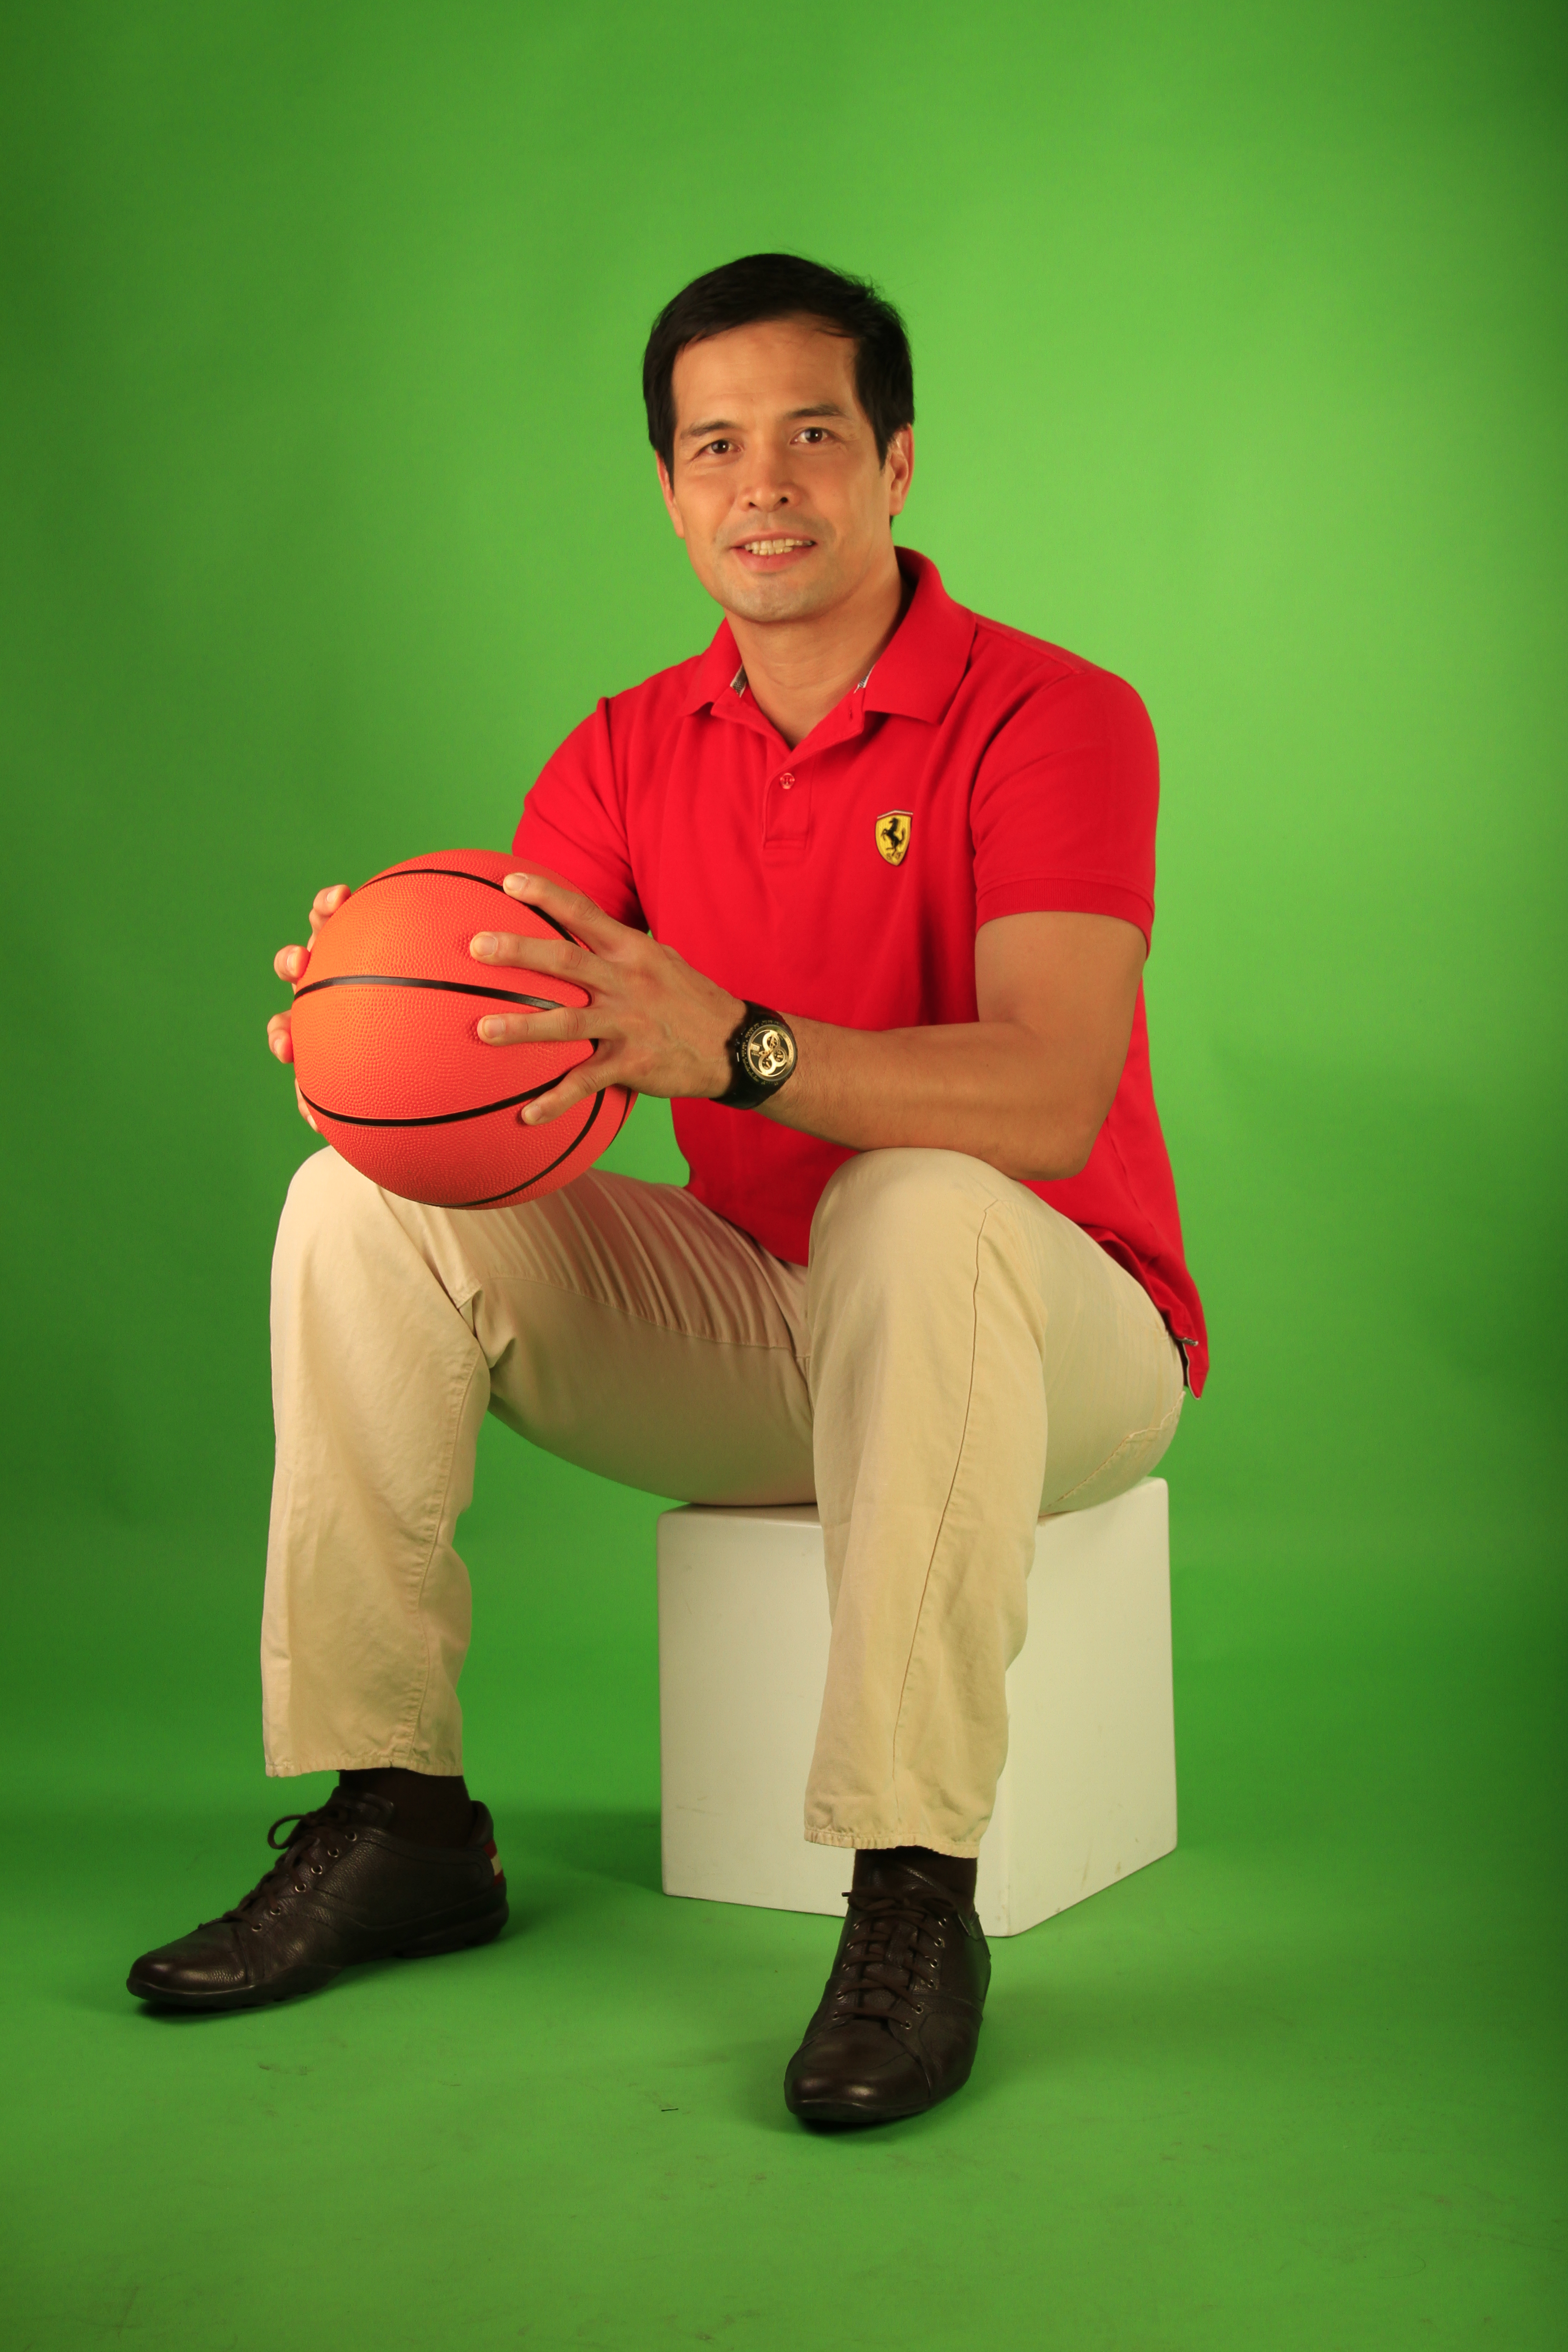 Jaguar San Jose >> Sportsman Wants Affordable Wellness for Filipinos